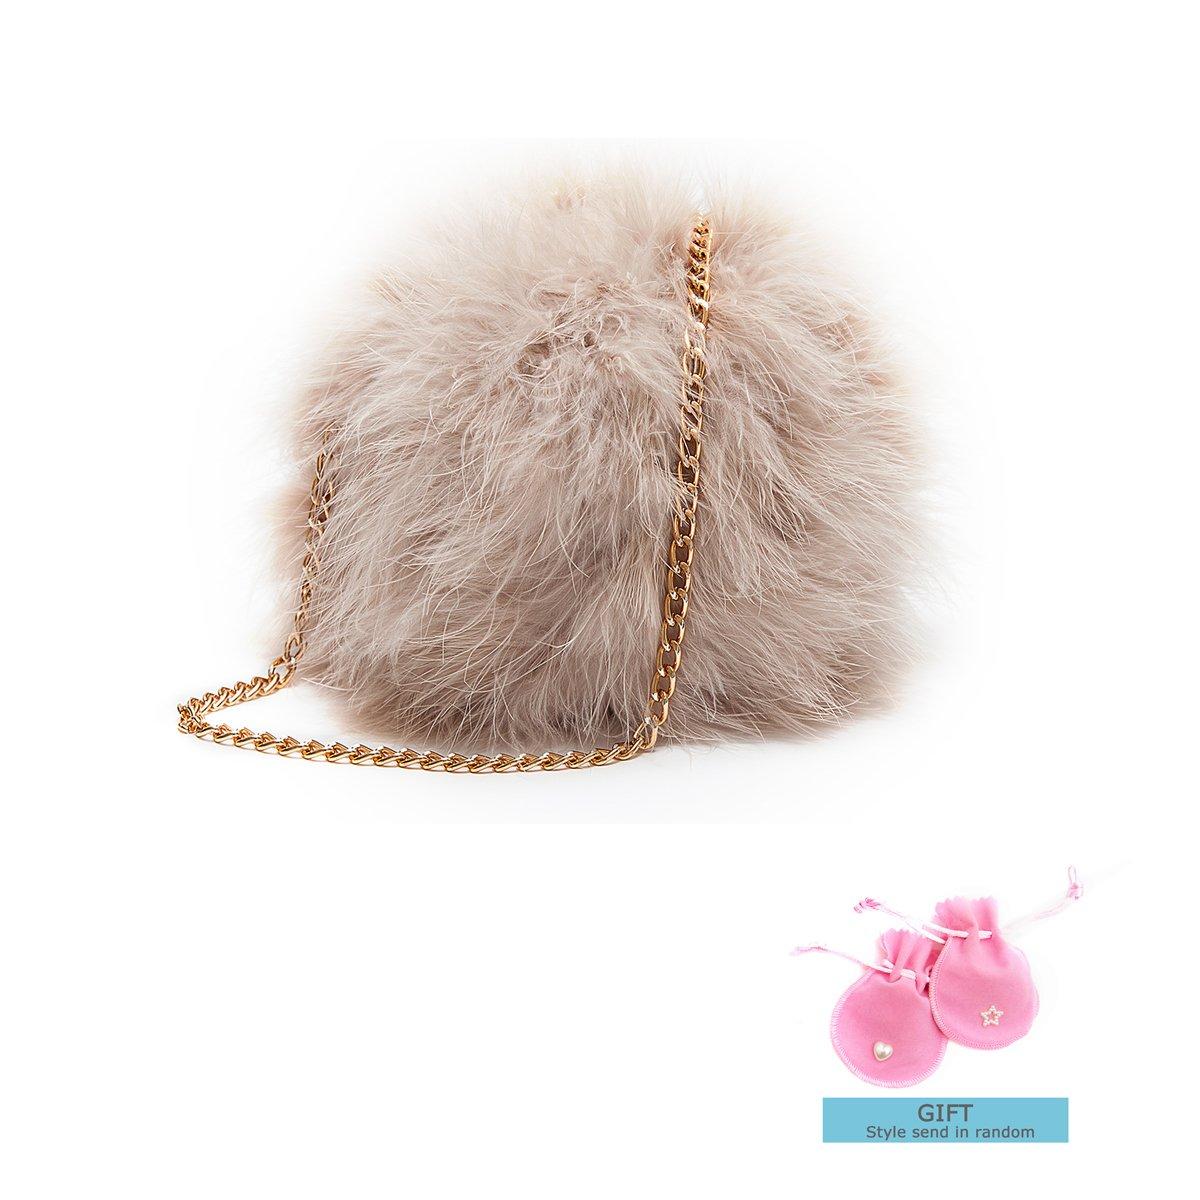 Zarapack Women\'s Genuine Fluffy Feather Fur Round Clutch Shoulder Bag (Light Pinkpurple) BA755